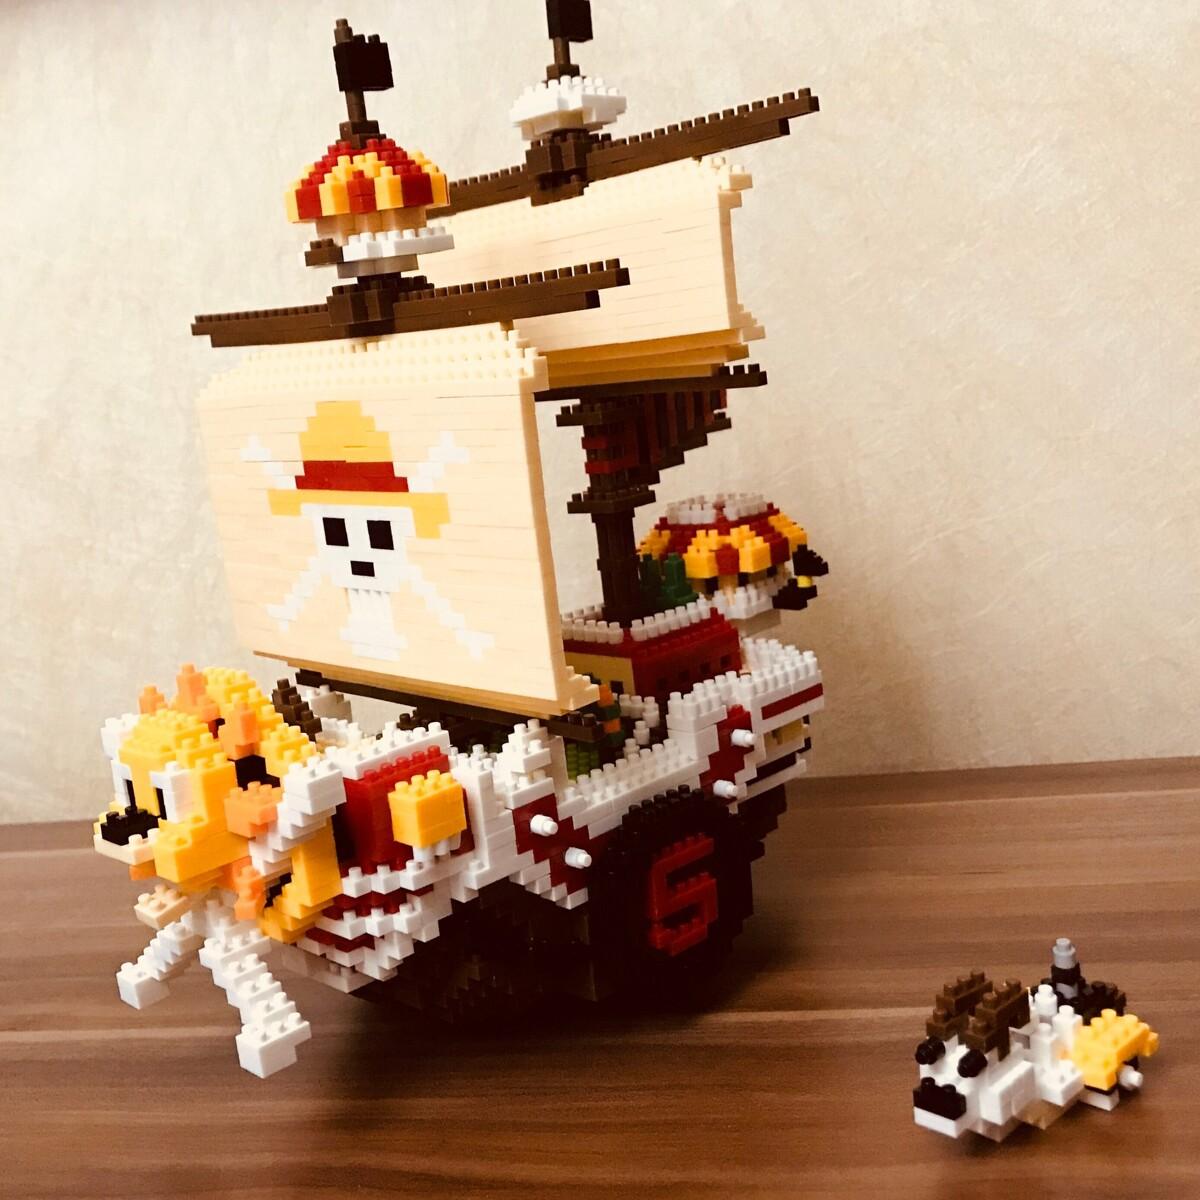 HC 9035 Luffy Sunny Pirate Ship Boat One Piece Brickheadz